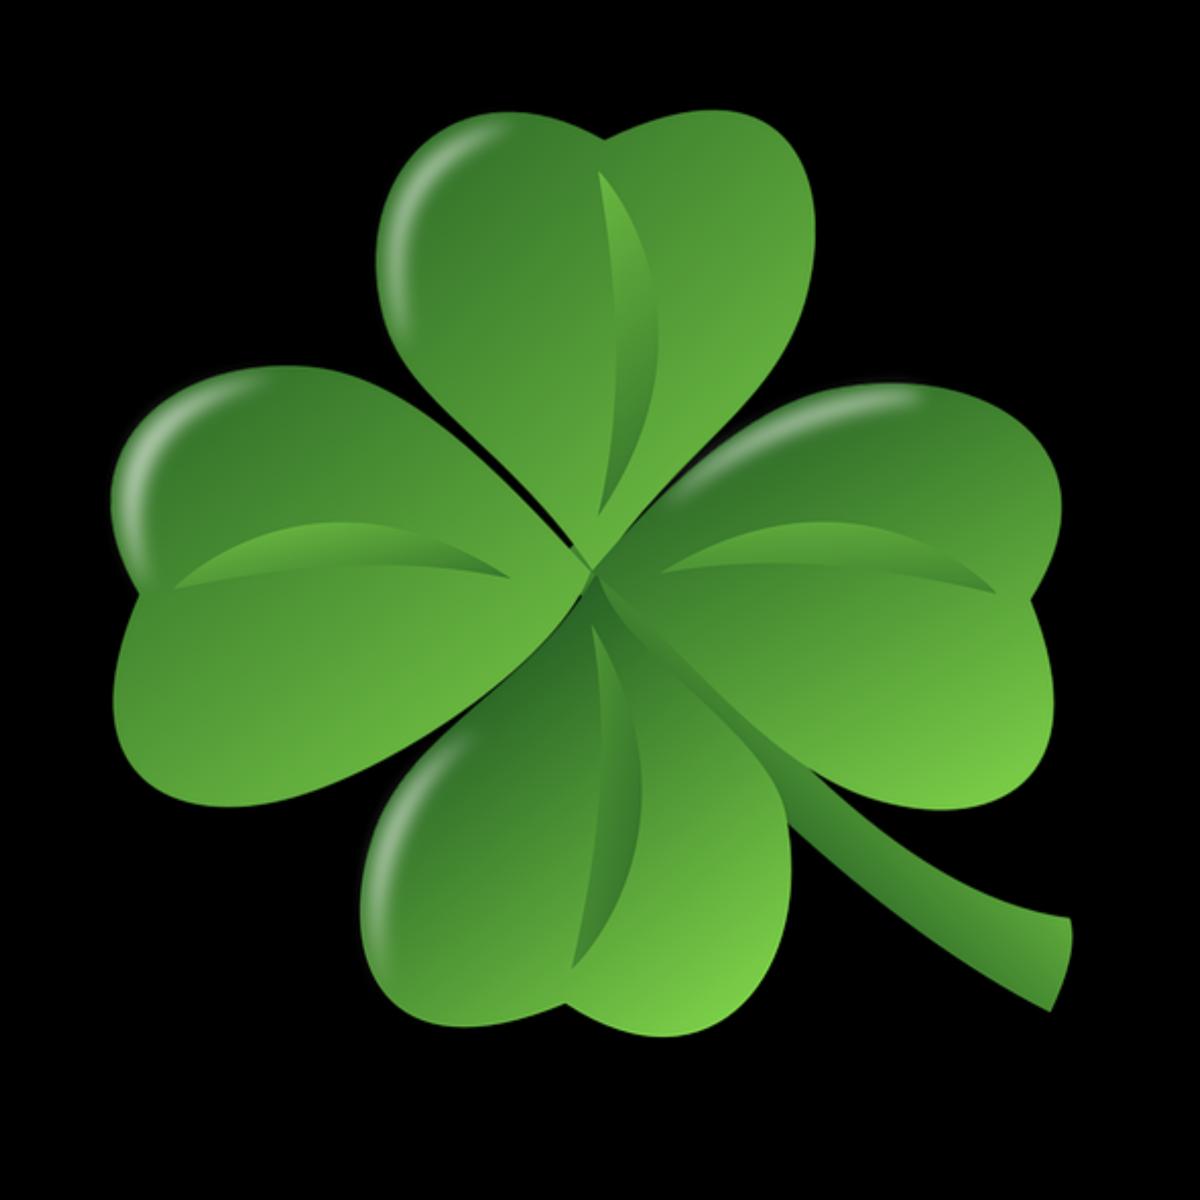 Four Leaf Clover Advocate4autism S Artist Shop Four Leaf Clover Tattoo St Patricks Day Wallpaper Clover Leaf